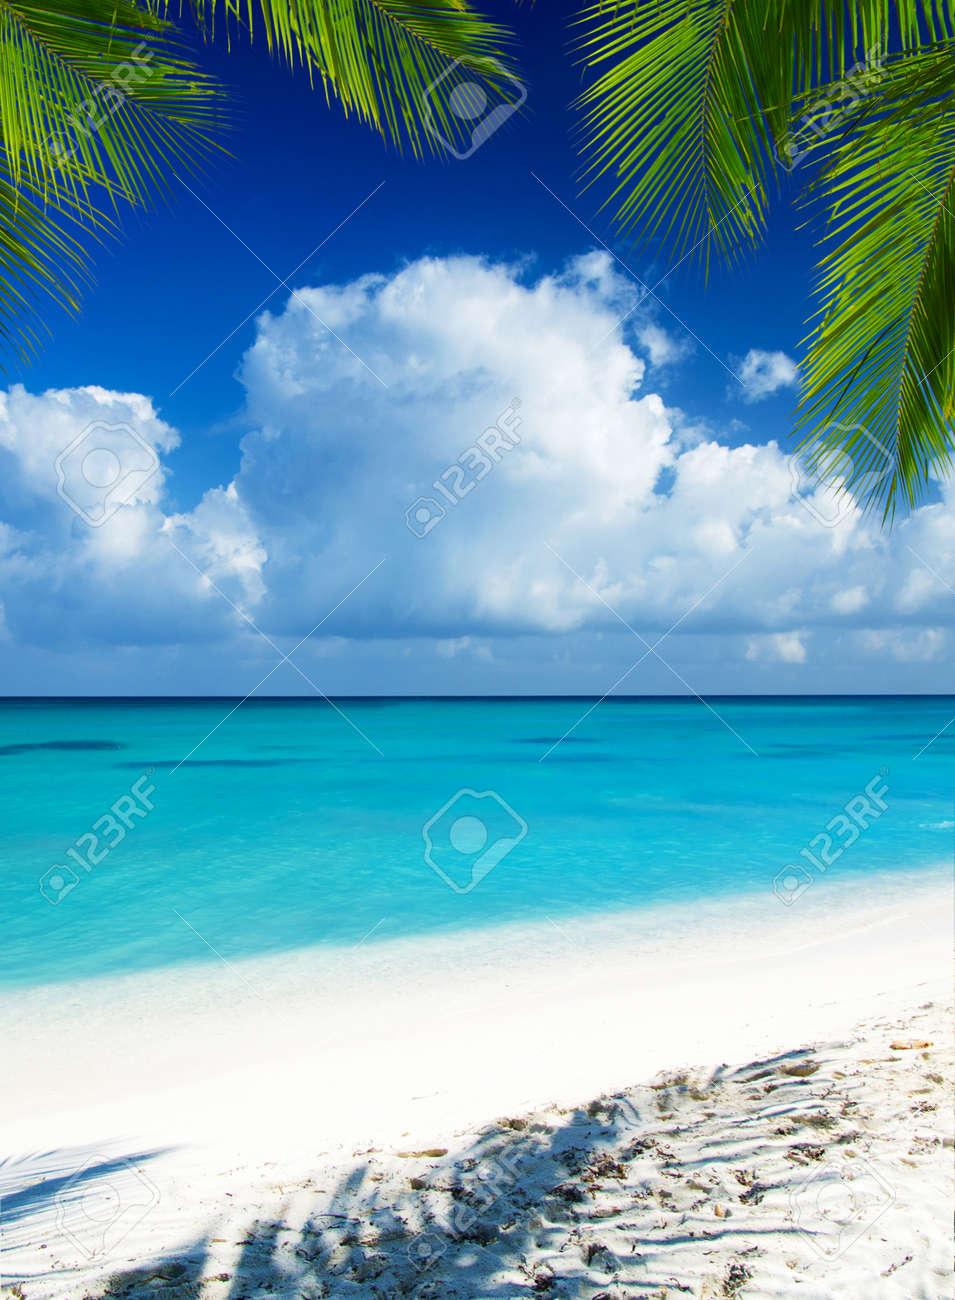 beach and tropical sea. tropical island - 134278261